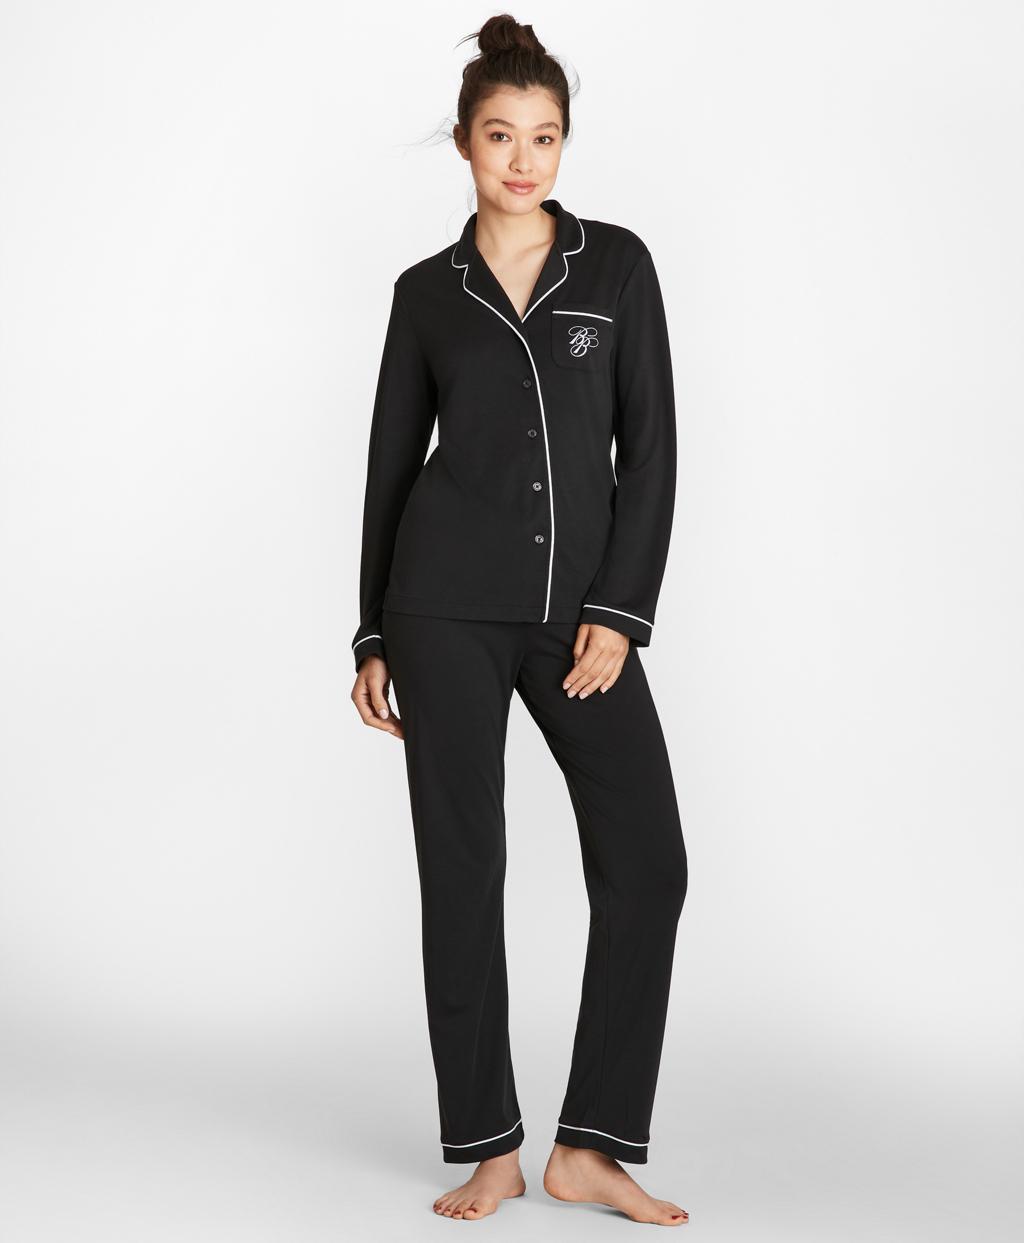 7a11f779d Brooks Brothers. Women s Black Logo-embroidered Pima Cotton Interlock  Jersey Pyjama Set